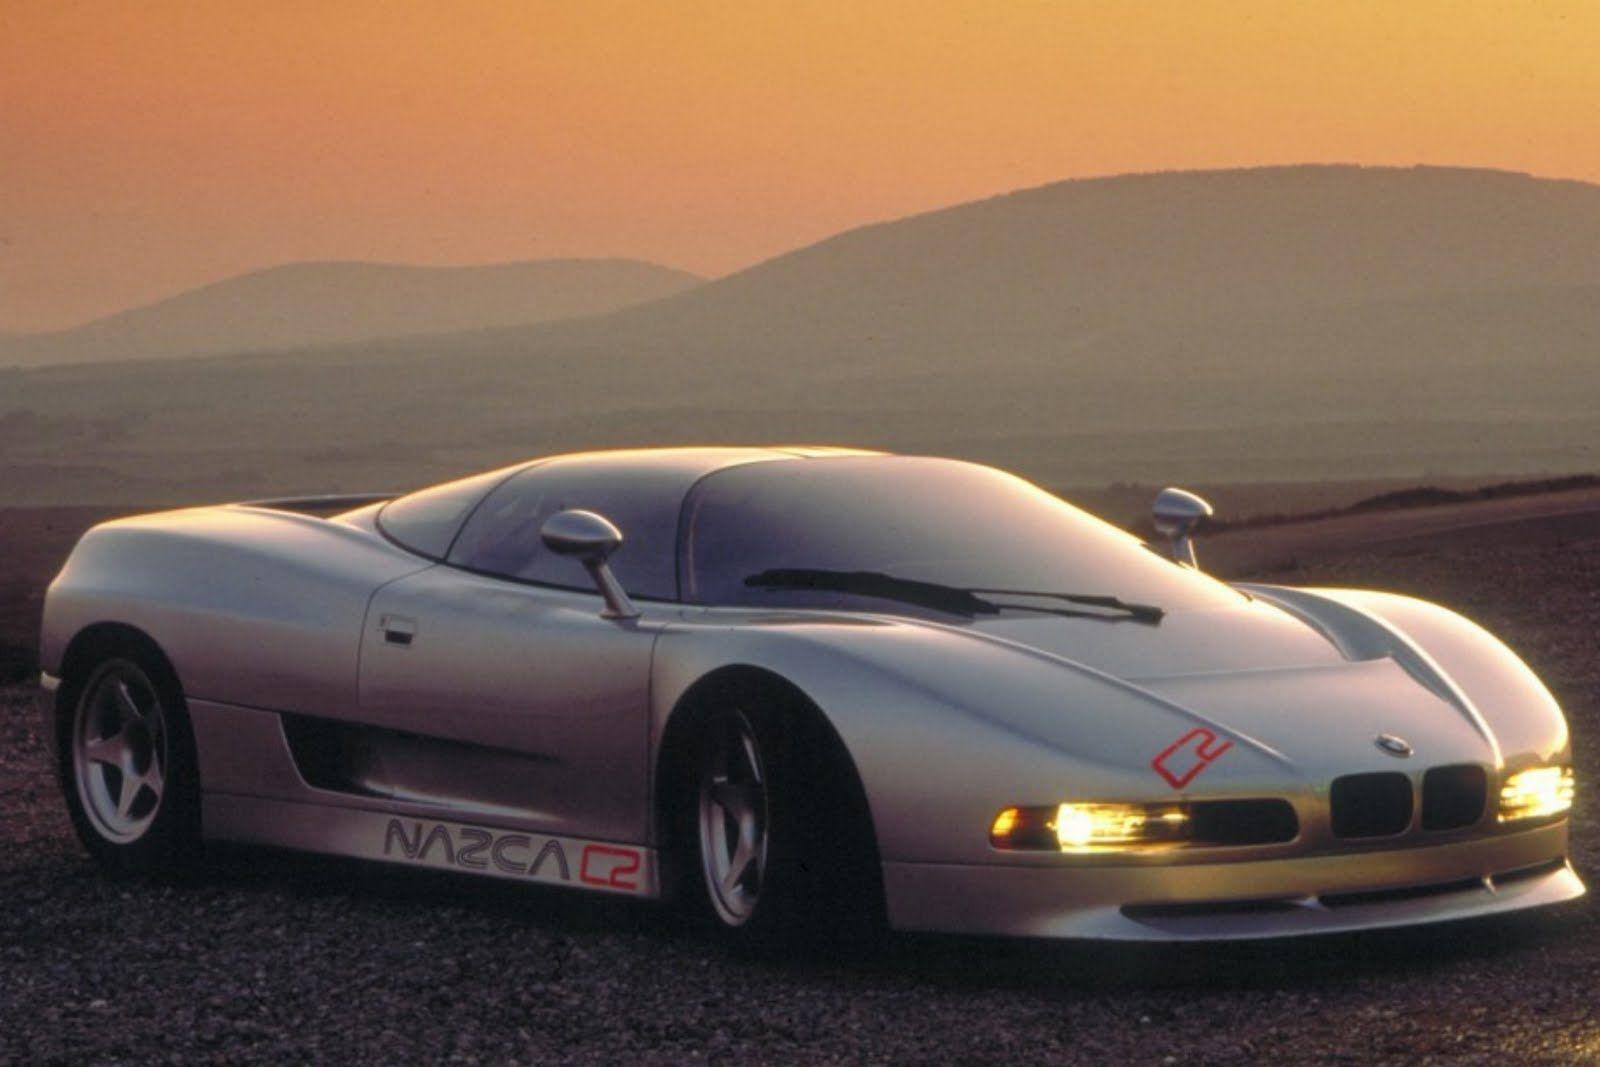 Super Rare Bmw Supercar For Sale Nazca M12 1 1 Million Bmw Concept Bmw Supercar Super Cars